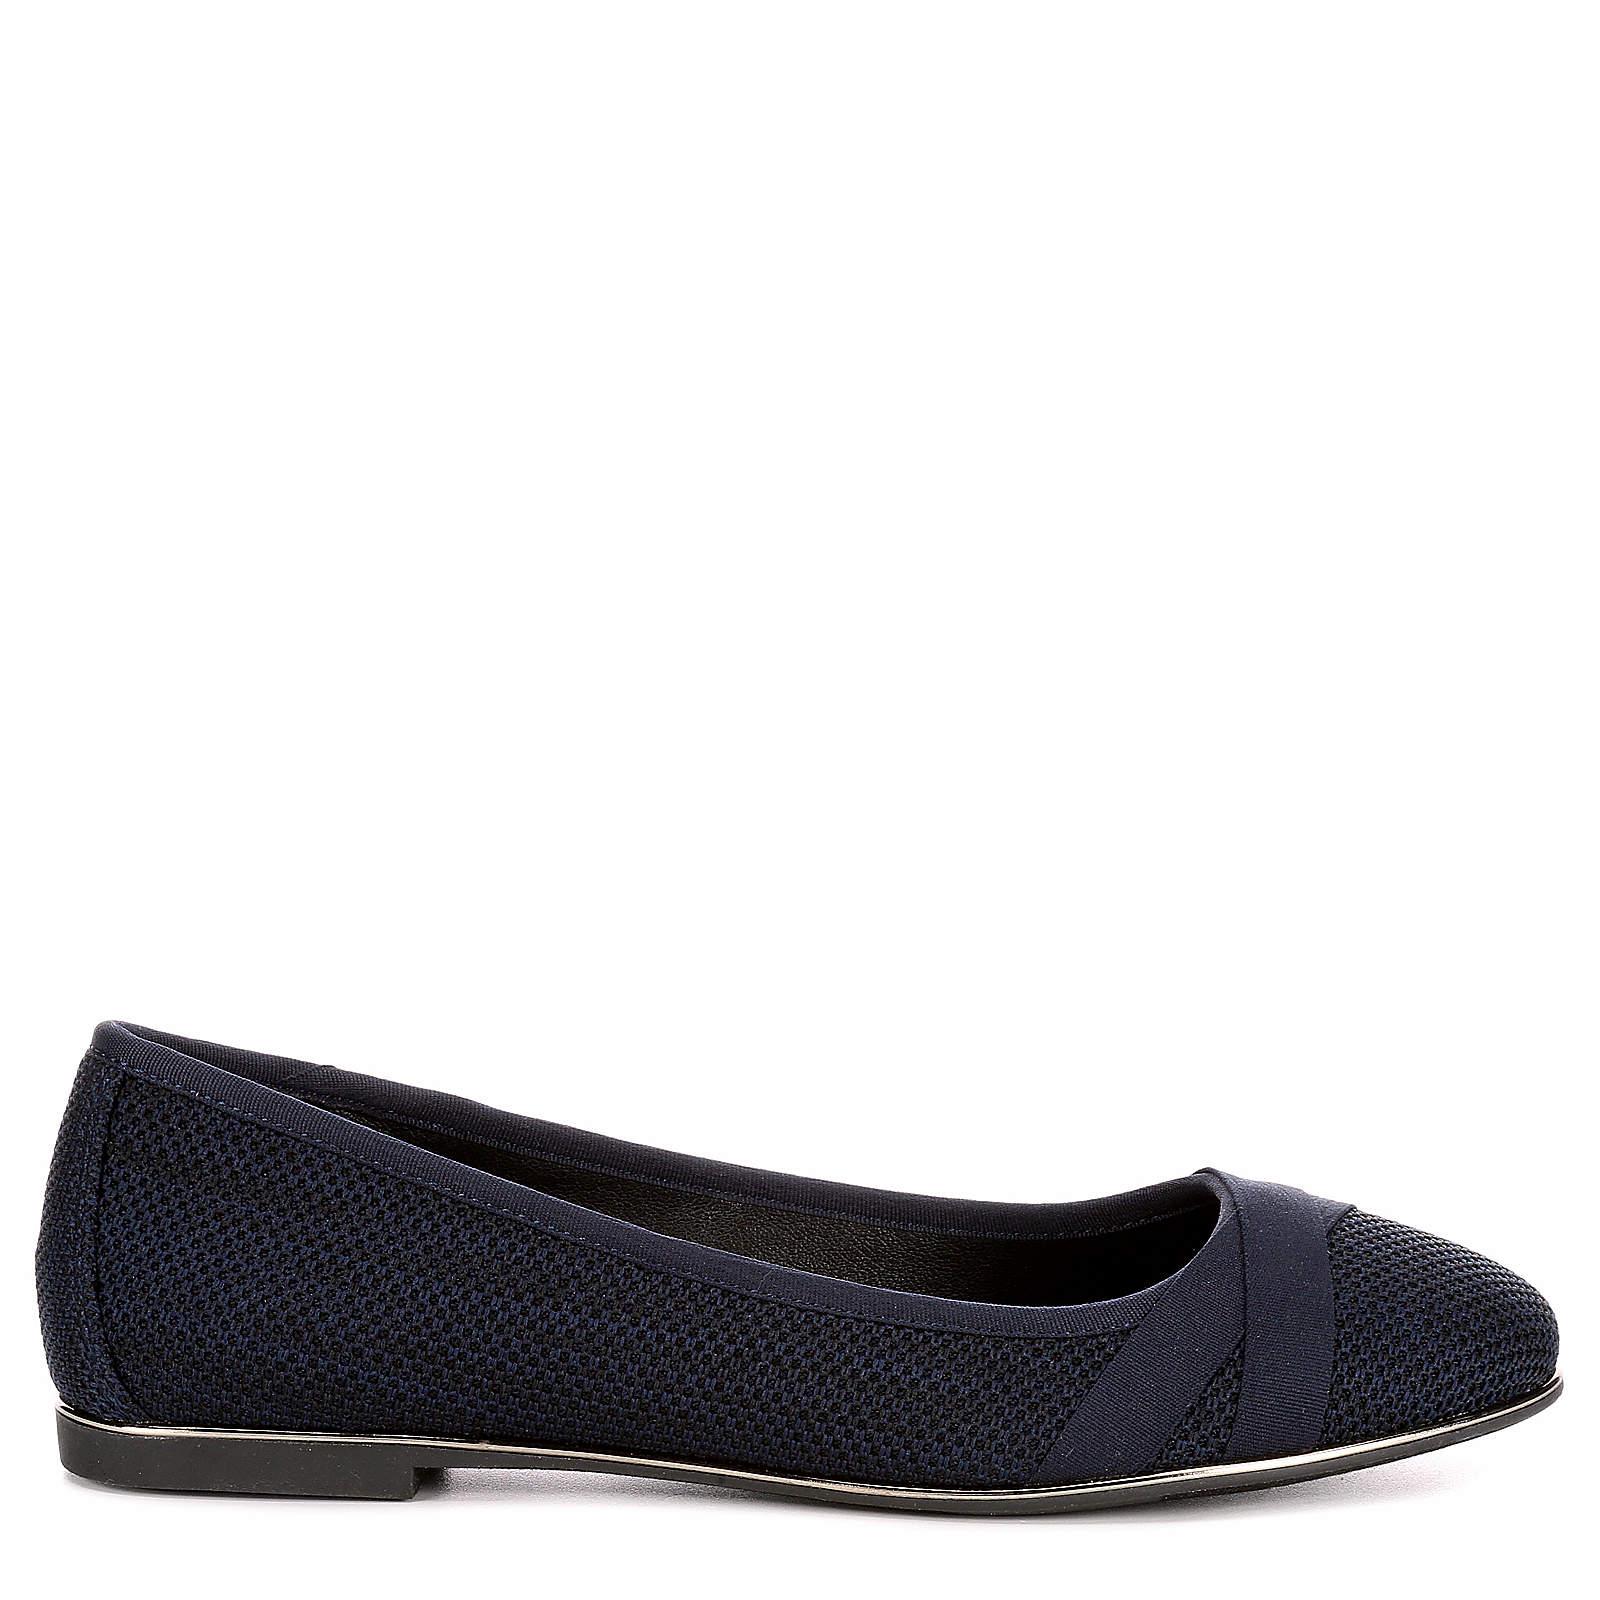 XAPPEAL-Womens-Mitzie-Slip-On-Mesh-Flat-Shoes thumbnail 3